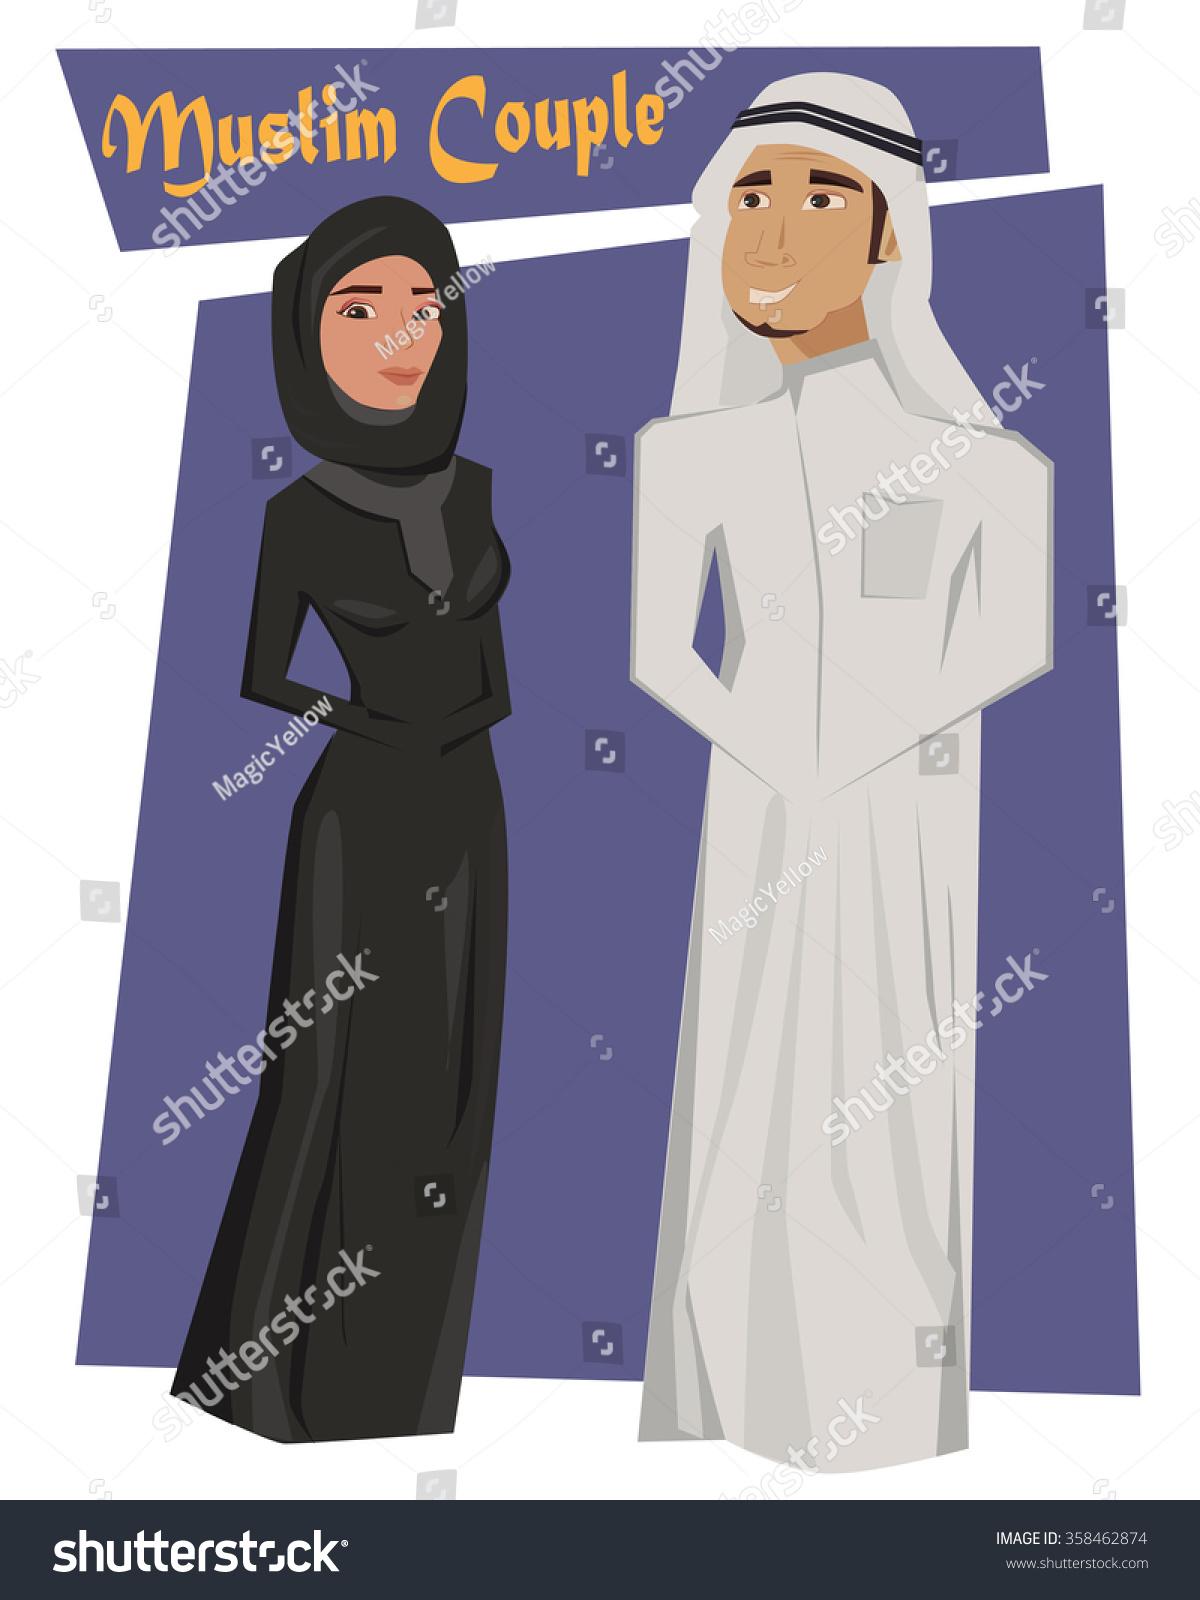 idaho falls muslim women dating site Meet thousands of handsome single men online seeking women for dating, love, marriage in idaho.